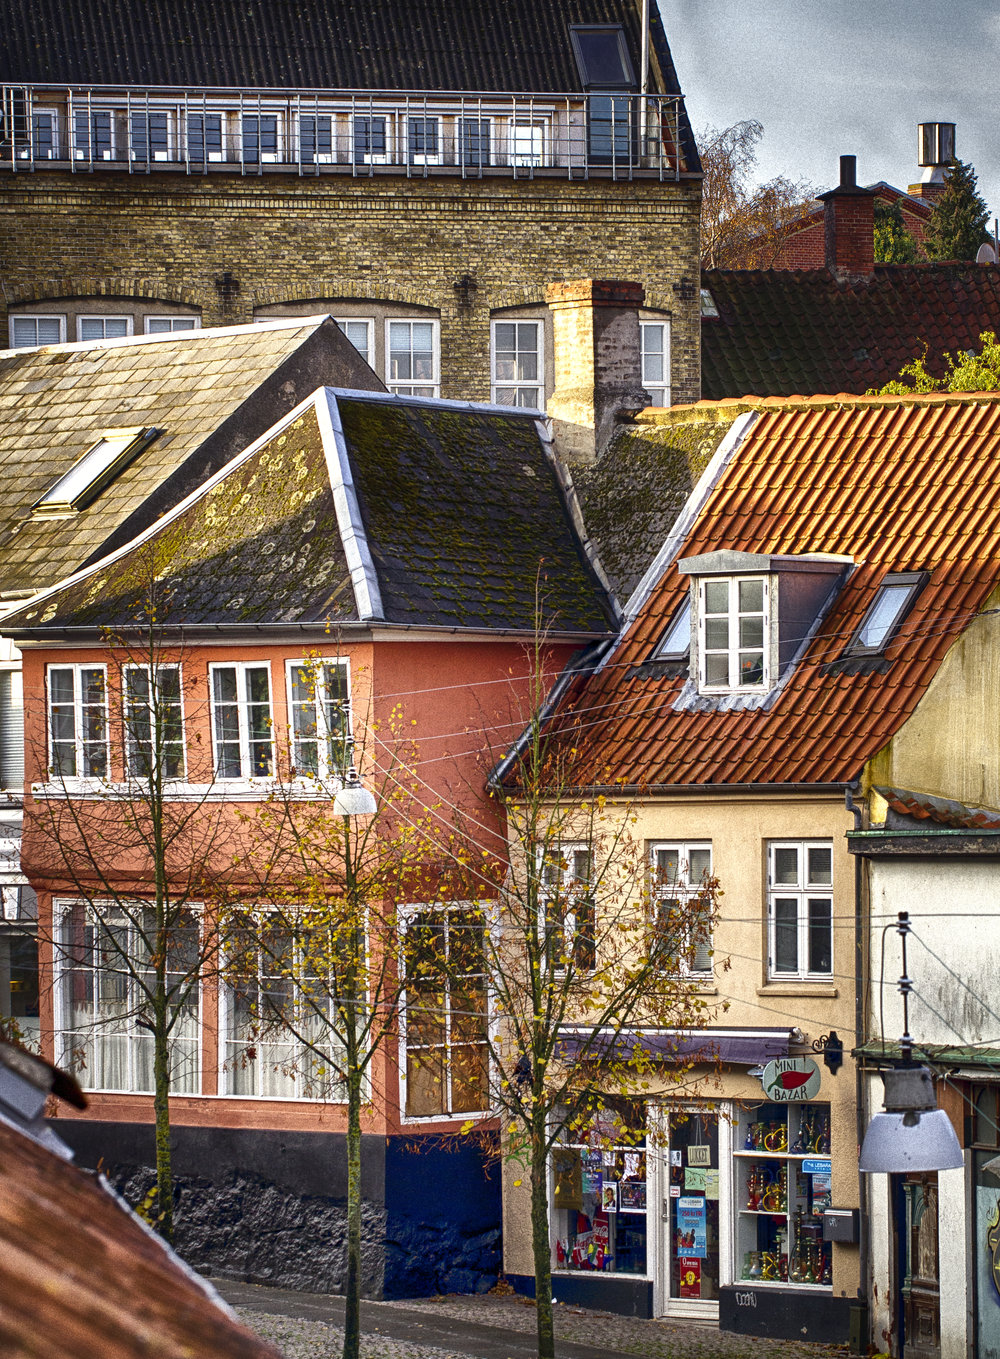 Cultures meet Read about Svendborg Comments